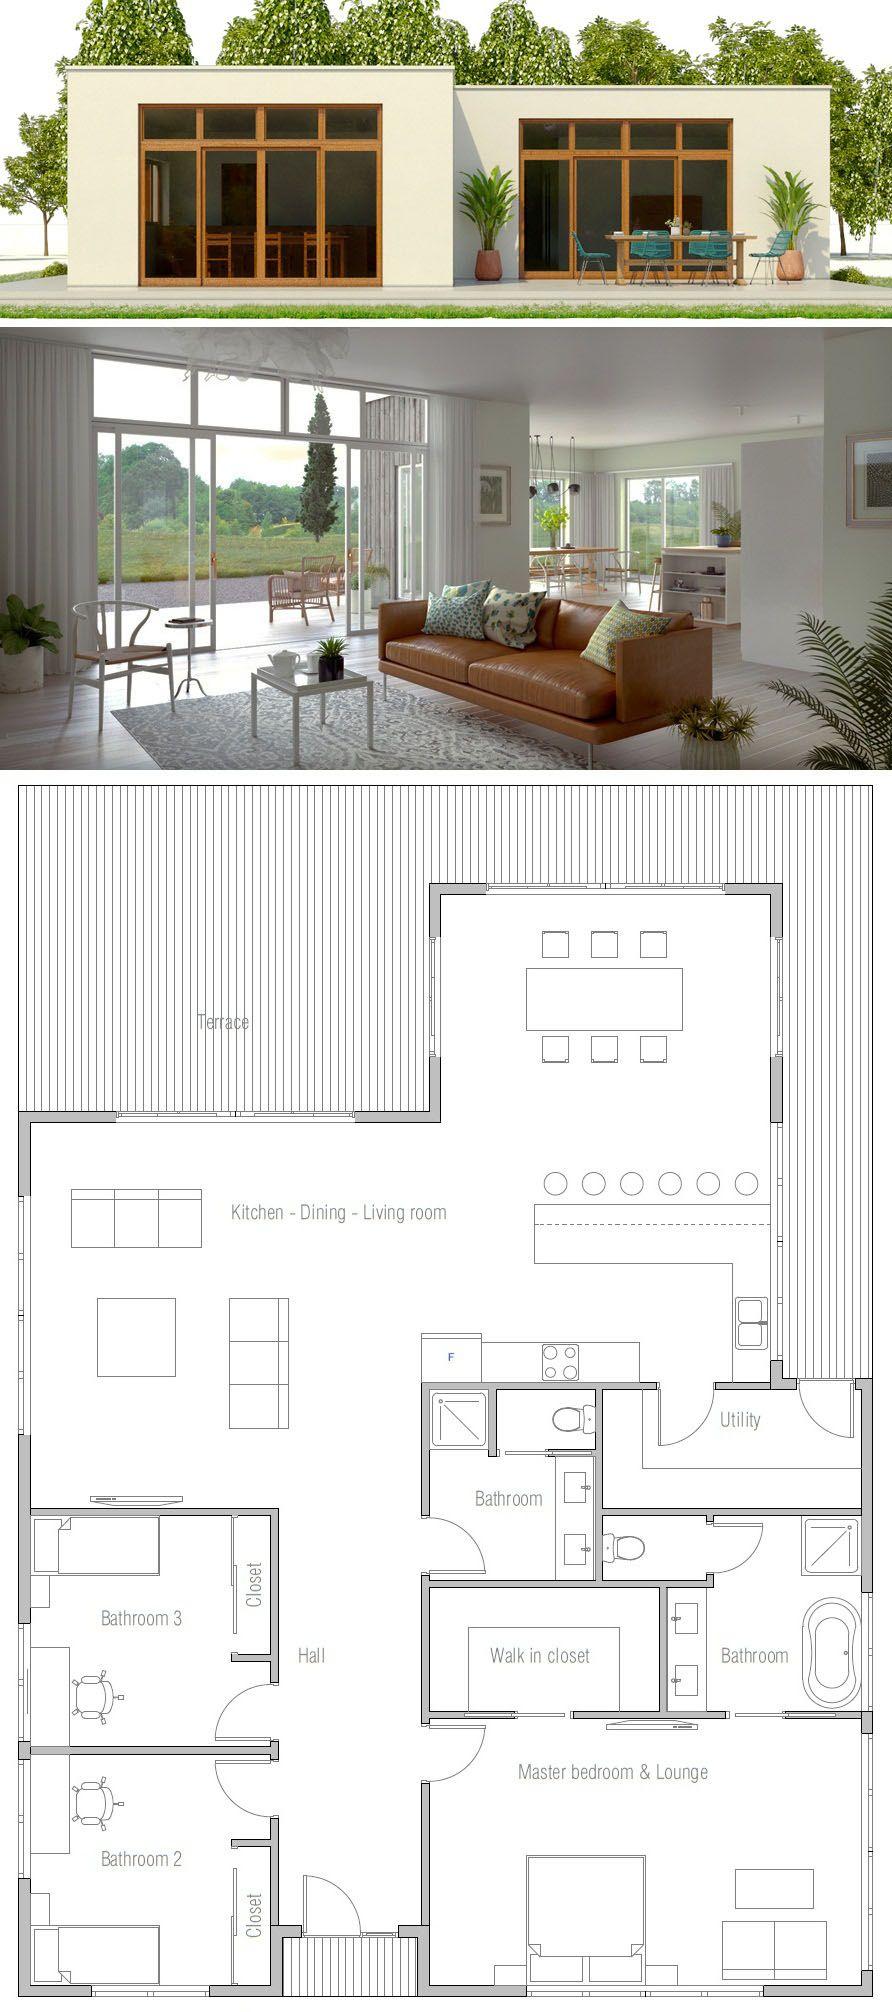 Modern Minimalist Design Contemporary House Plans House Plans Small House Plans